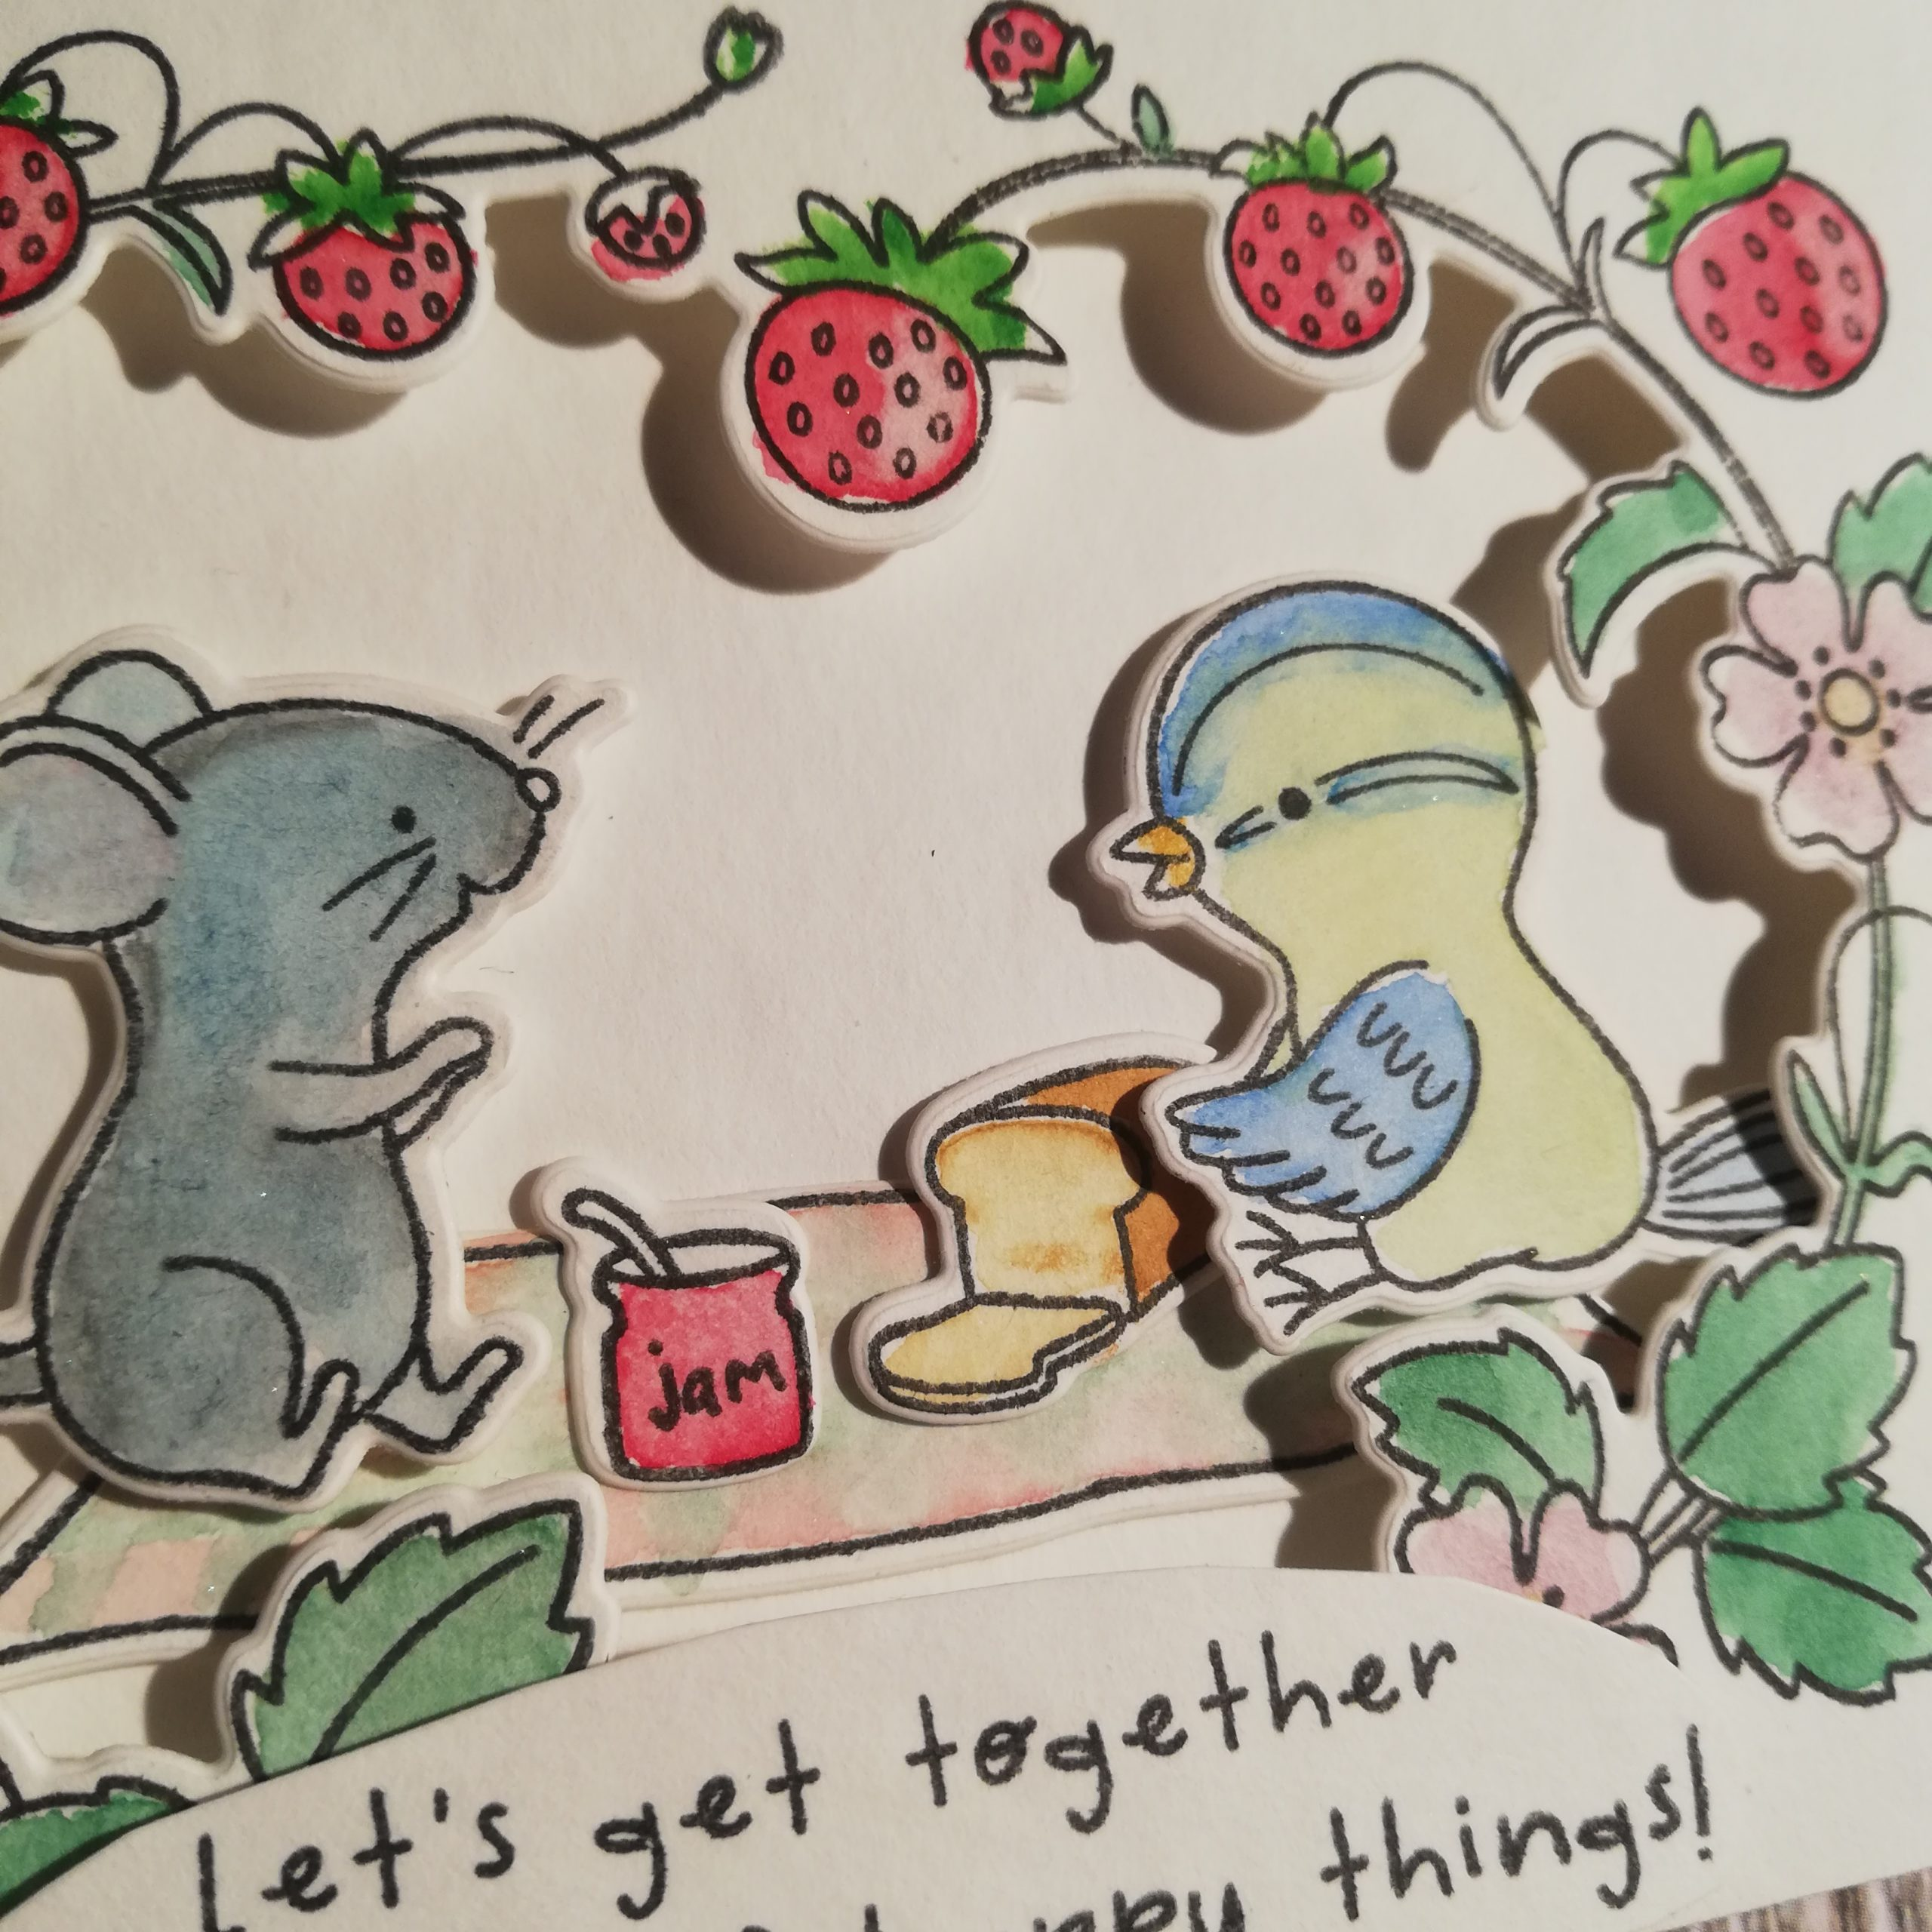 strawberry-jam-designteam-beitrag-fuer-mennys-bastelshop